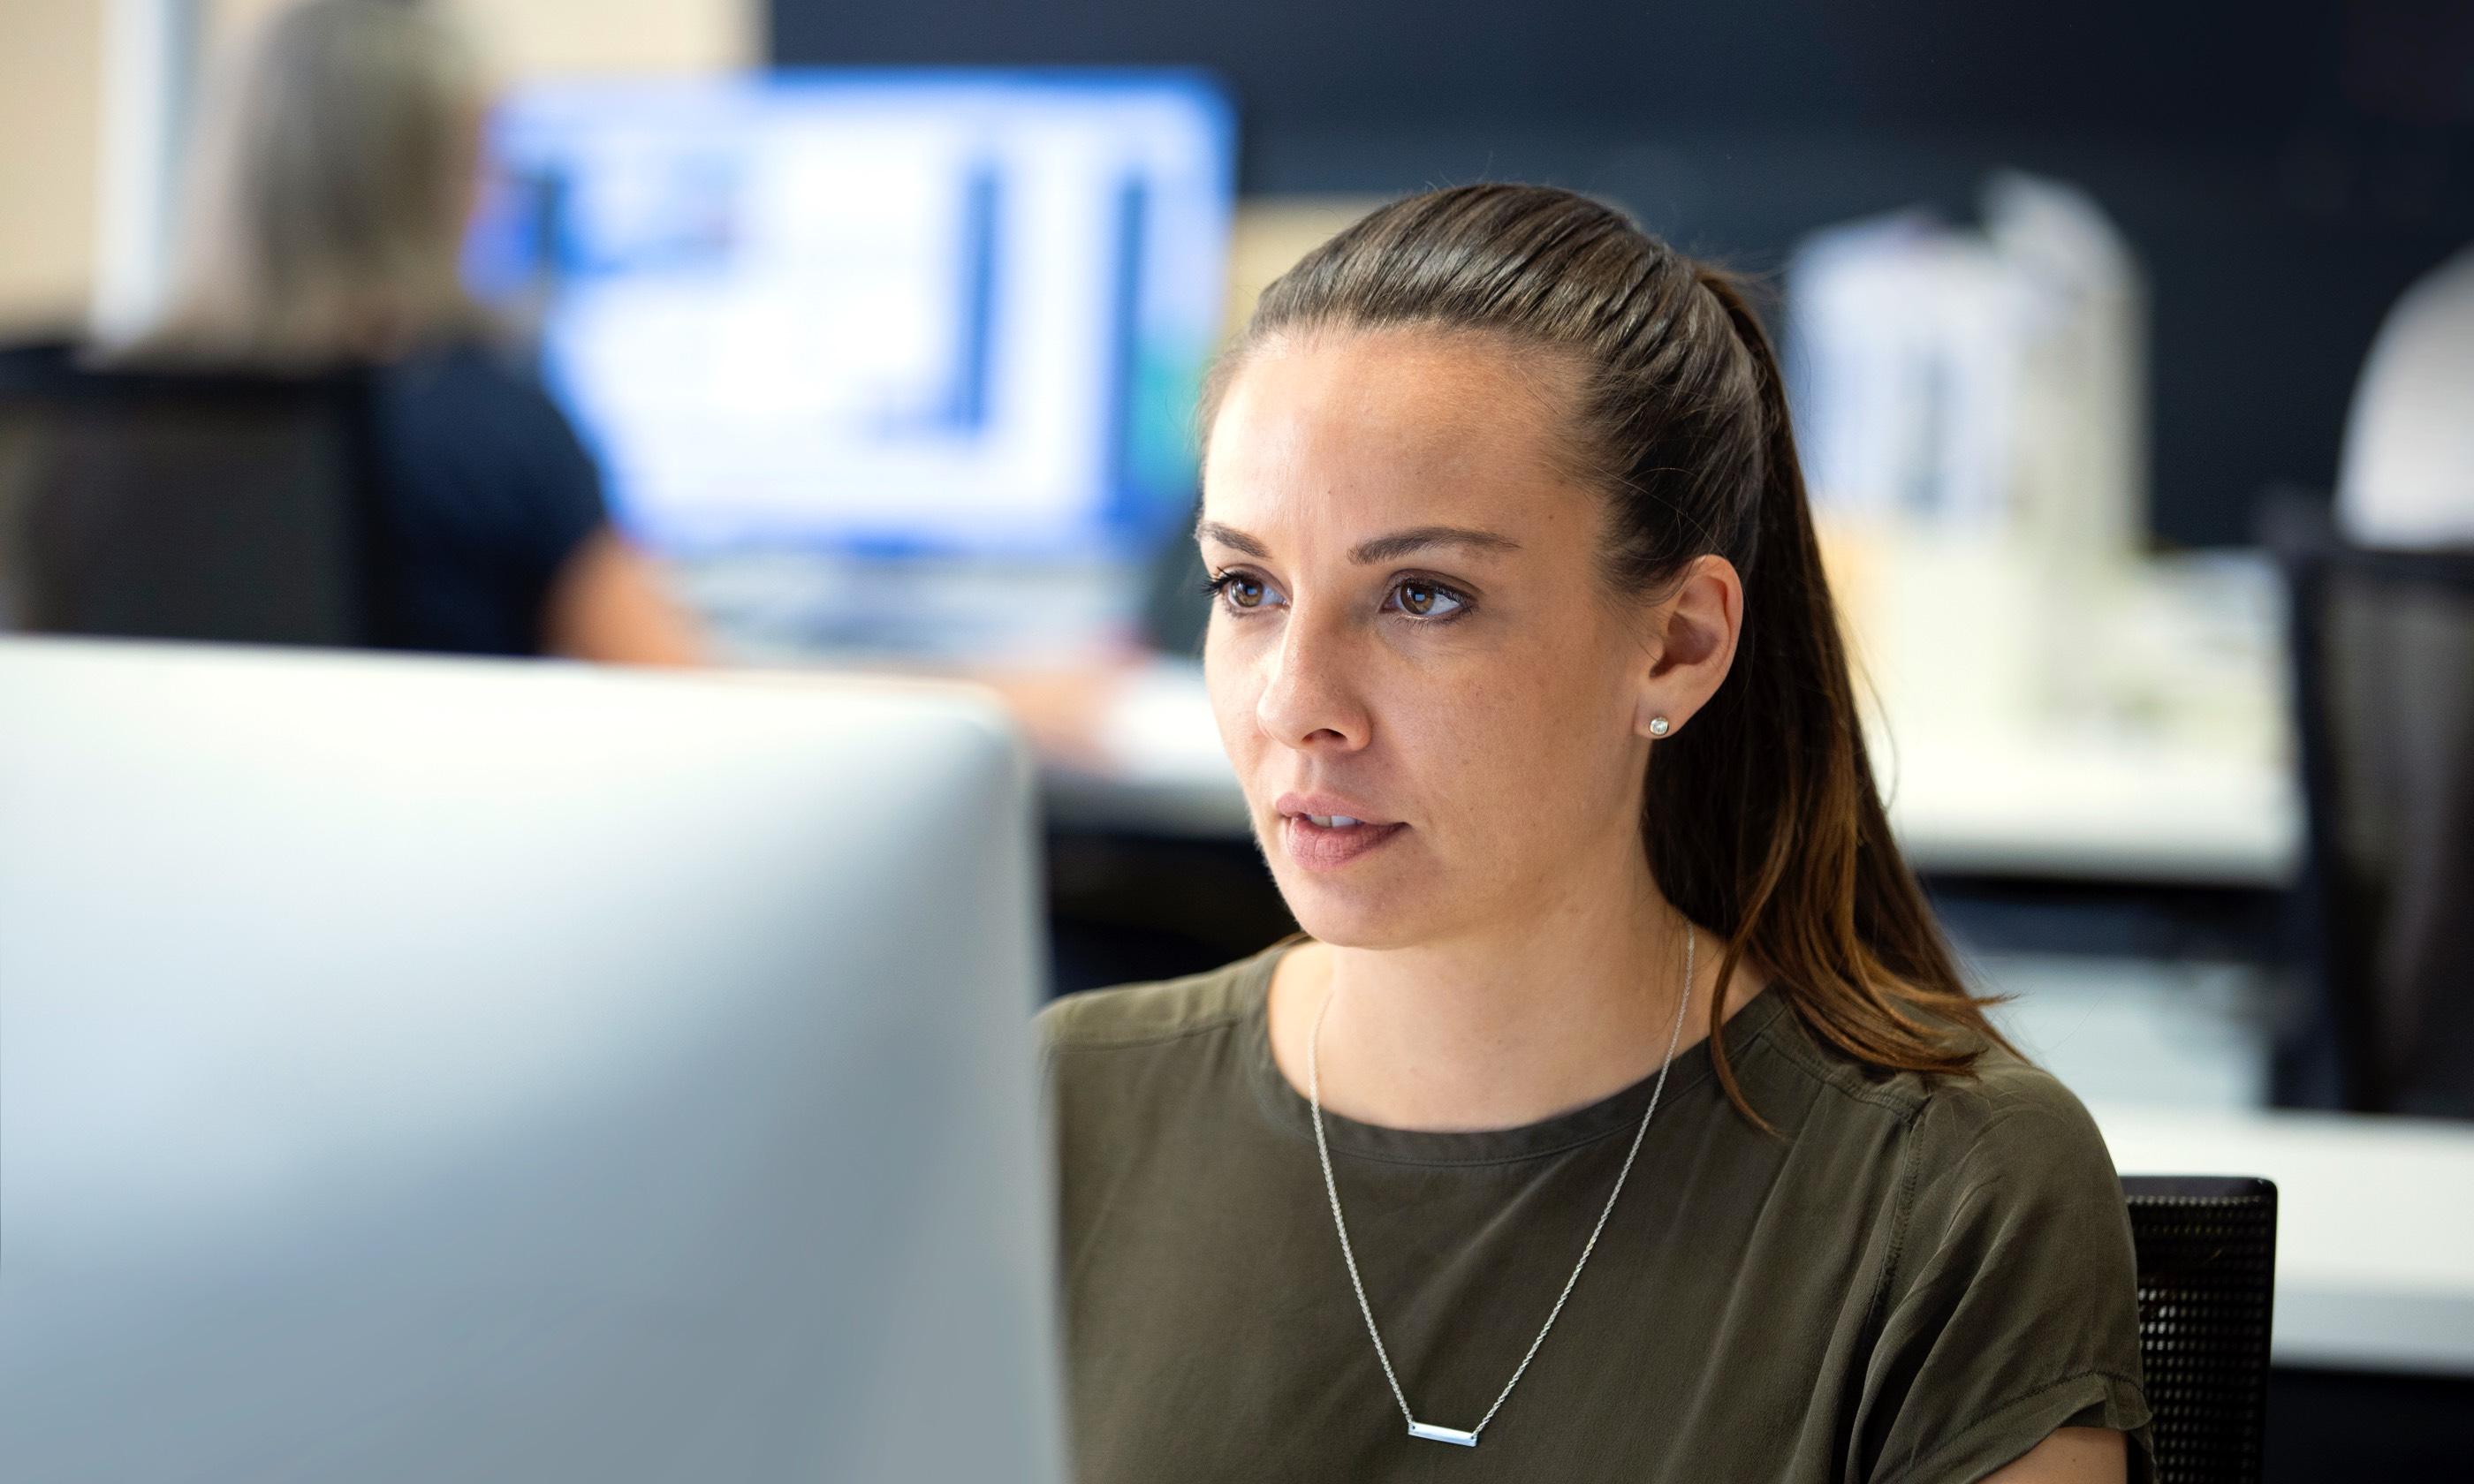 Designate team member working in studio at computer.